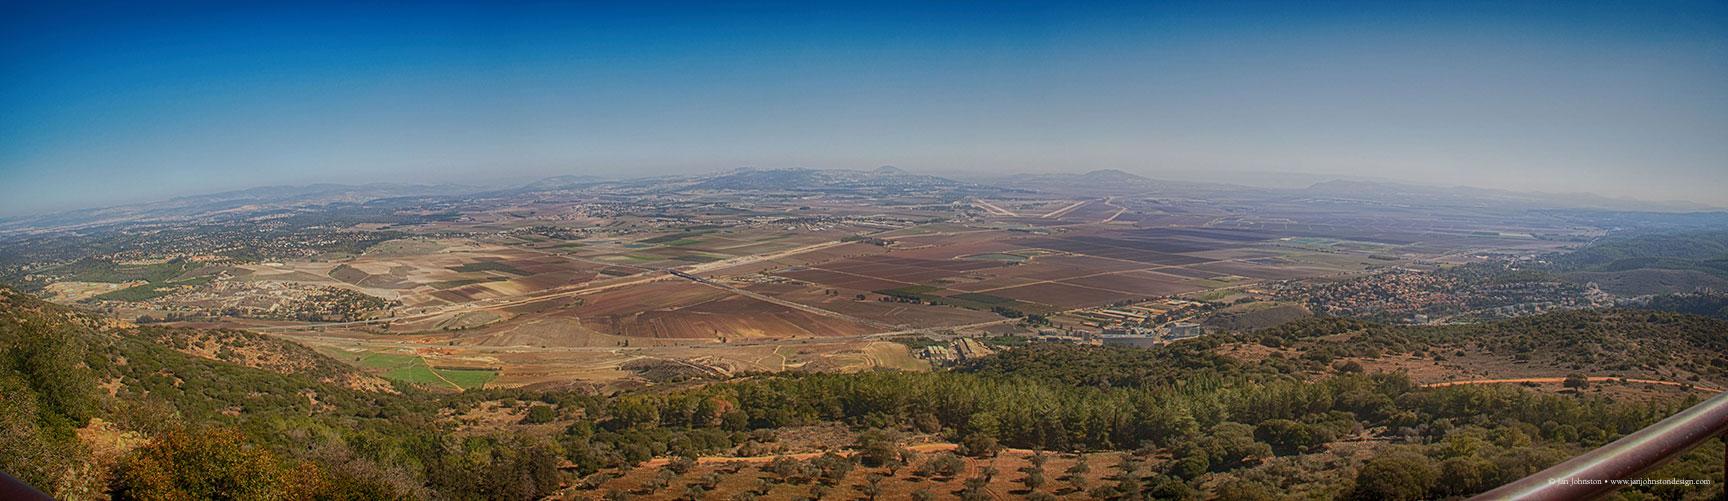 Armegeddon-Valley-Pano